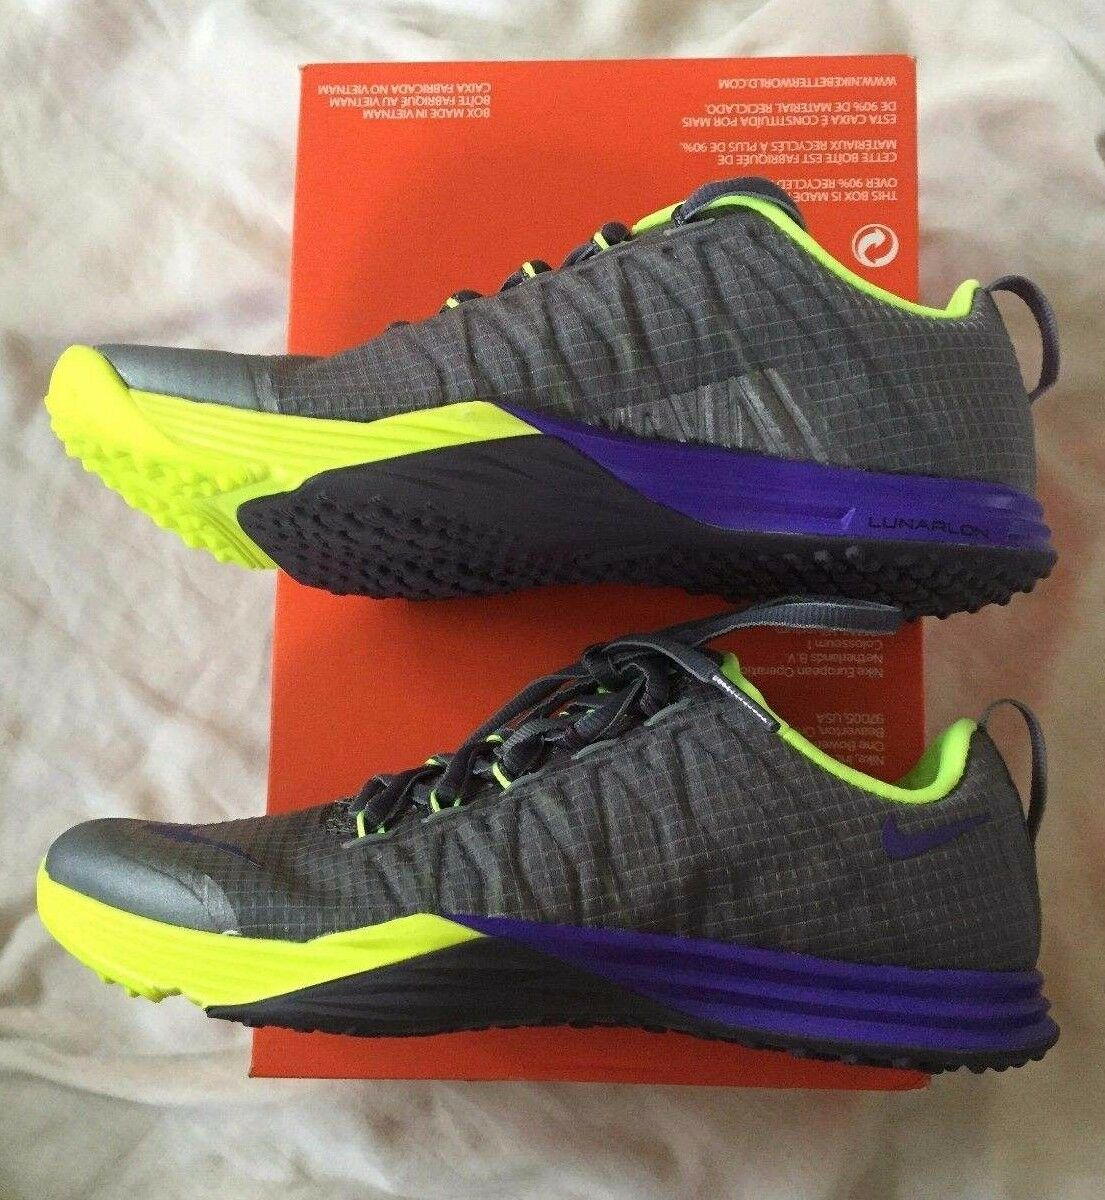 c52fc25cdb39 ... para Dama Nike Air Max Thea Zapatos Talla 5.5 Color  Color  ...